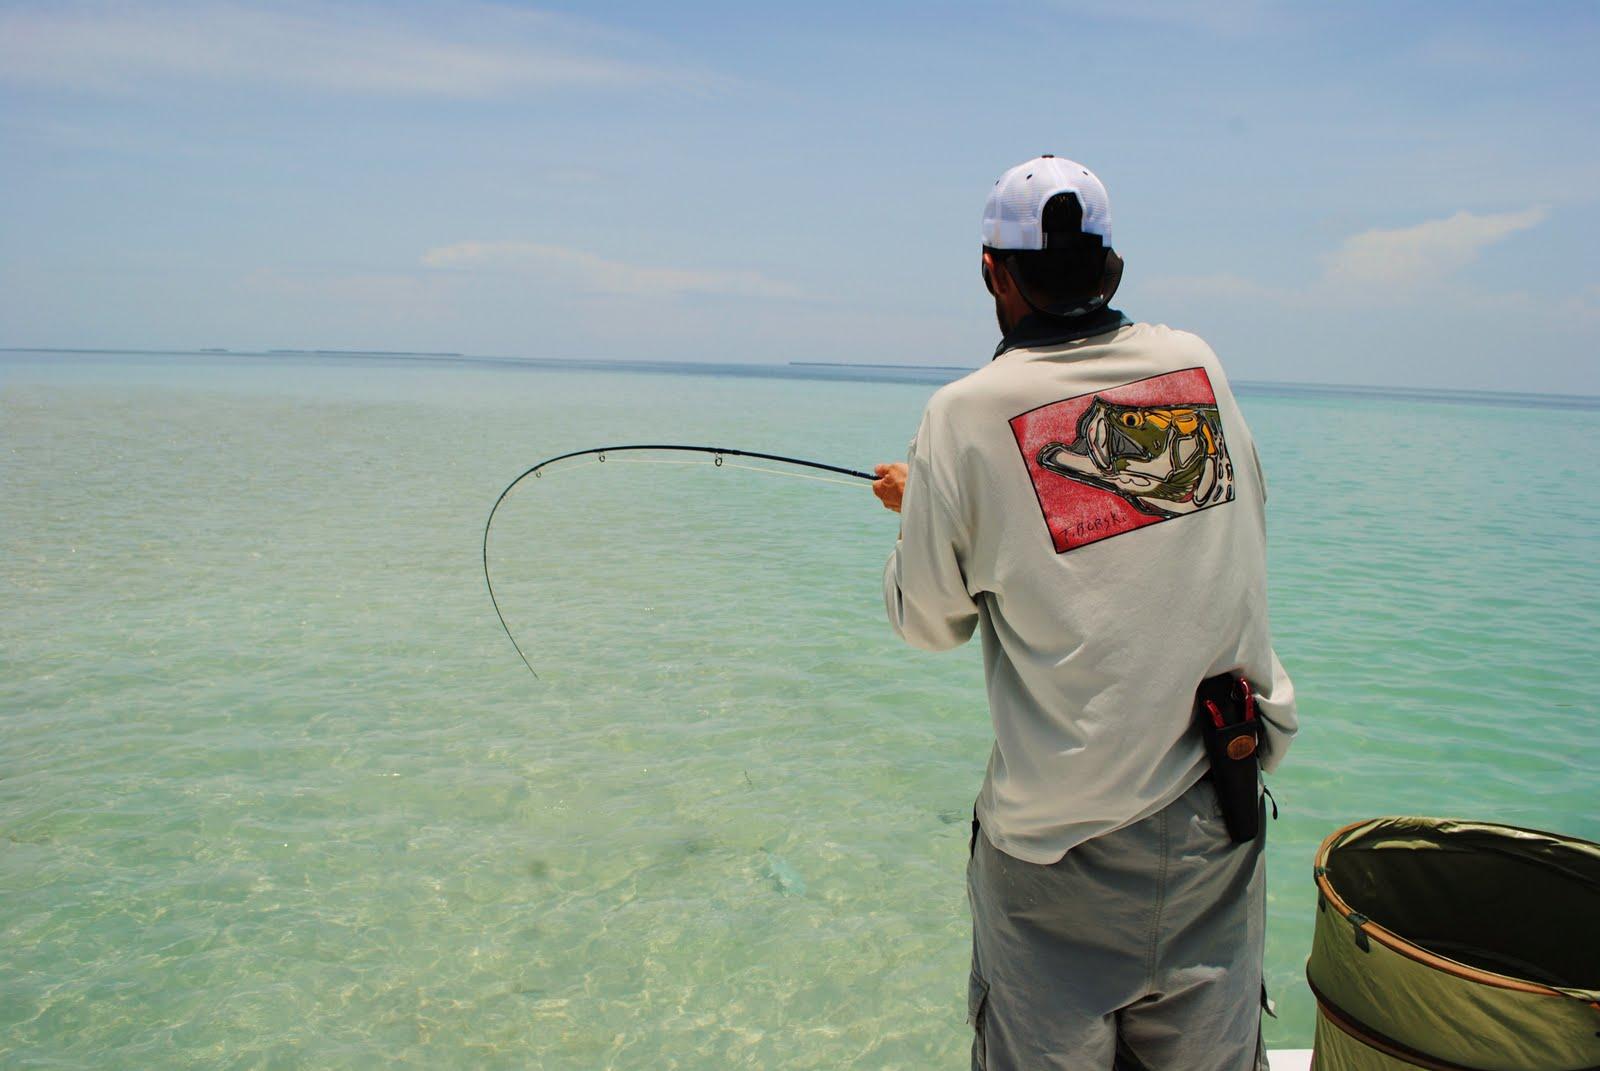 The pine island angler key west flats fishing part 1 for Bone fishing key west